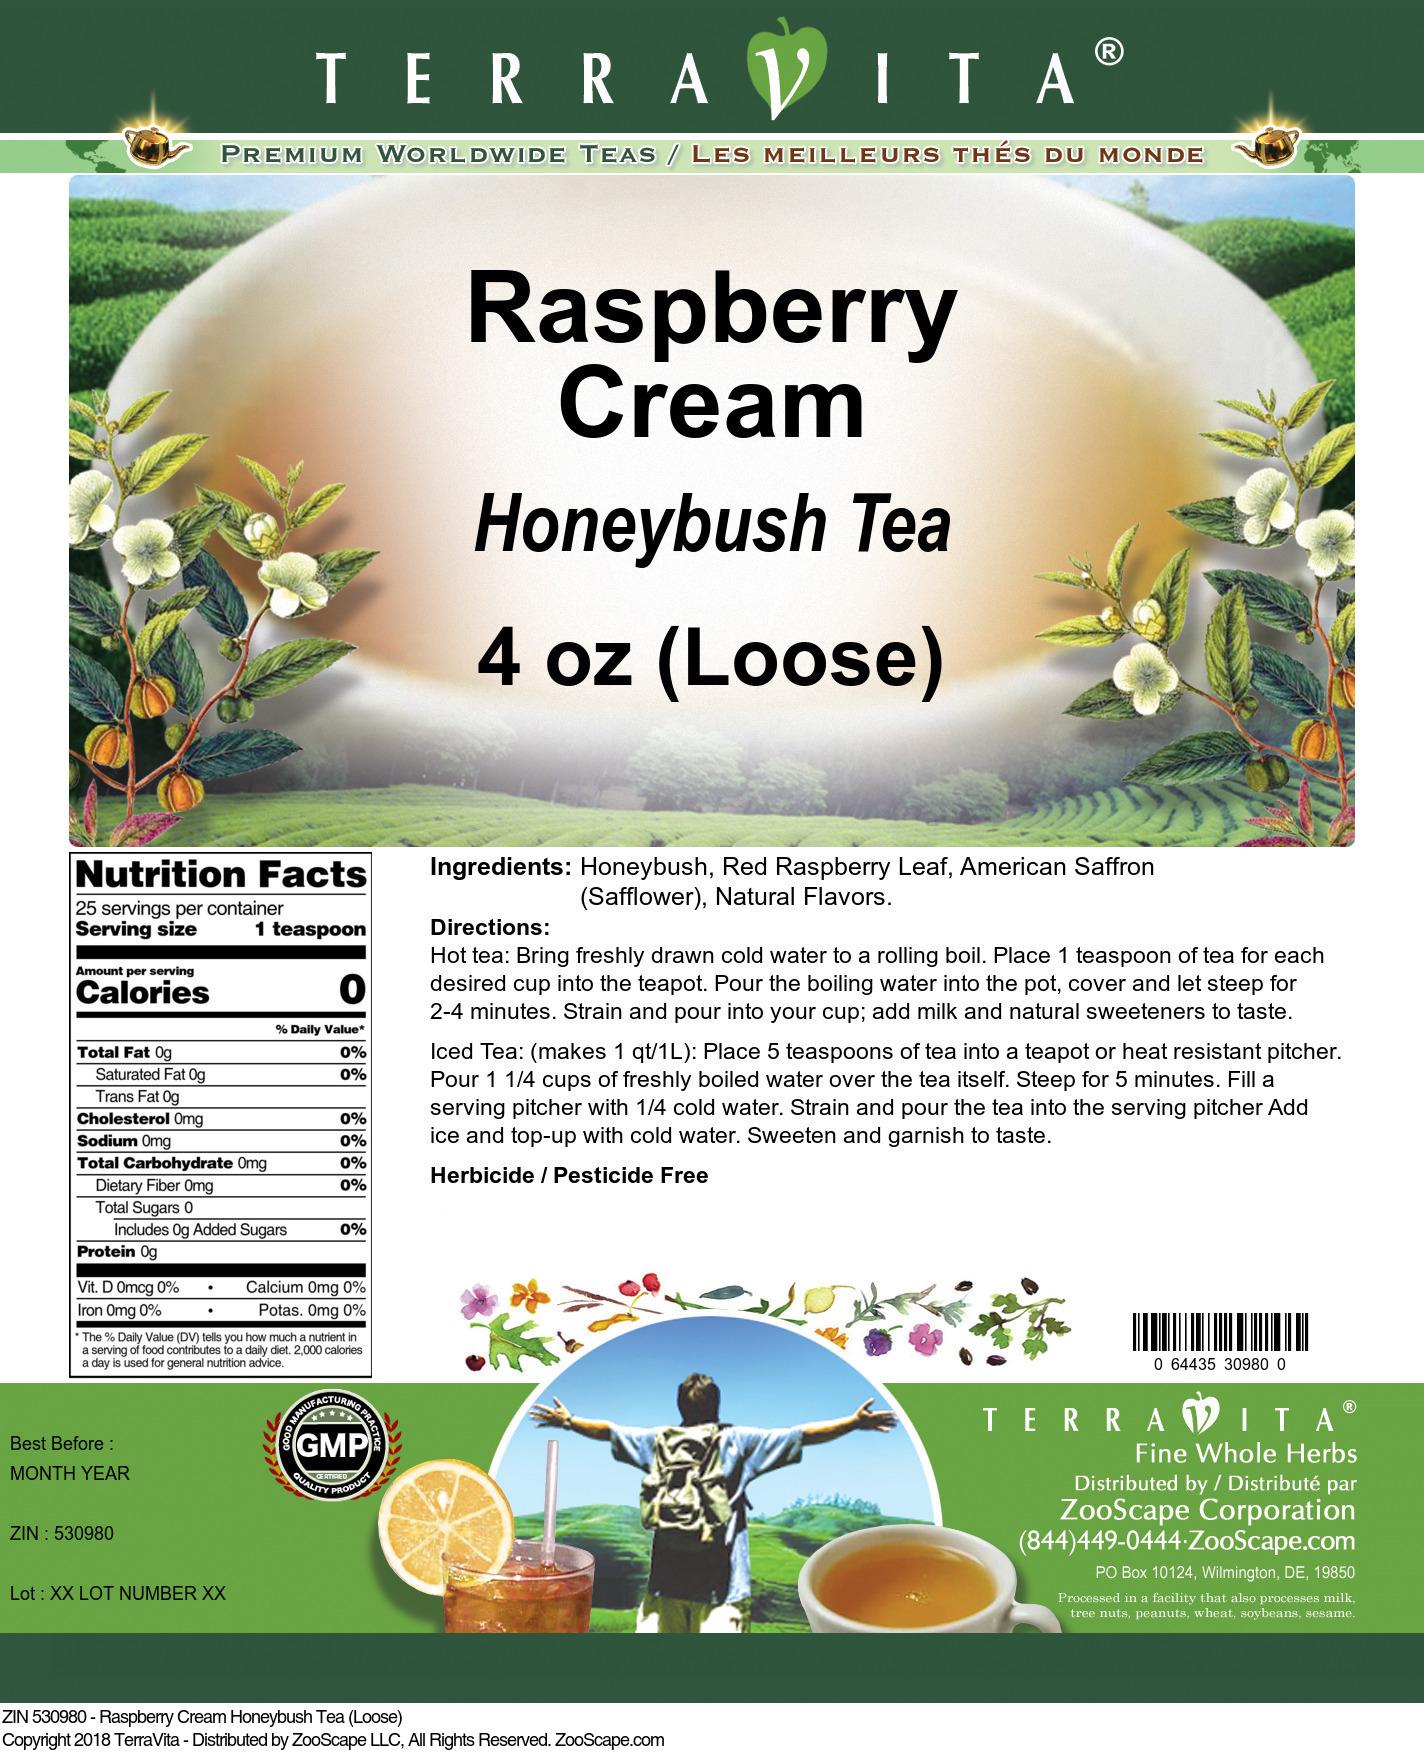 Raspberry Cream Honeybush Tea (Loose)